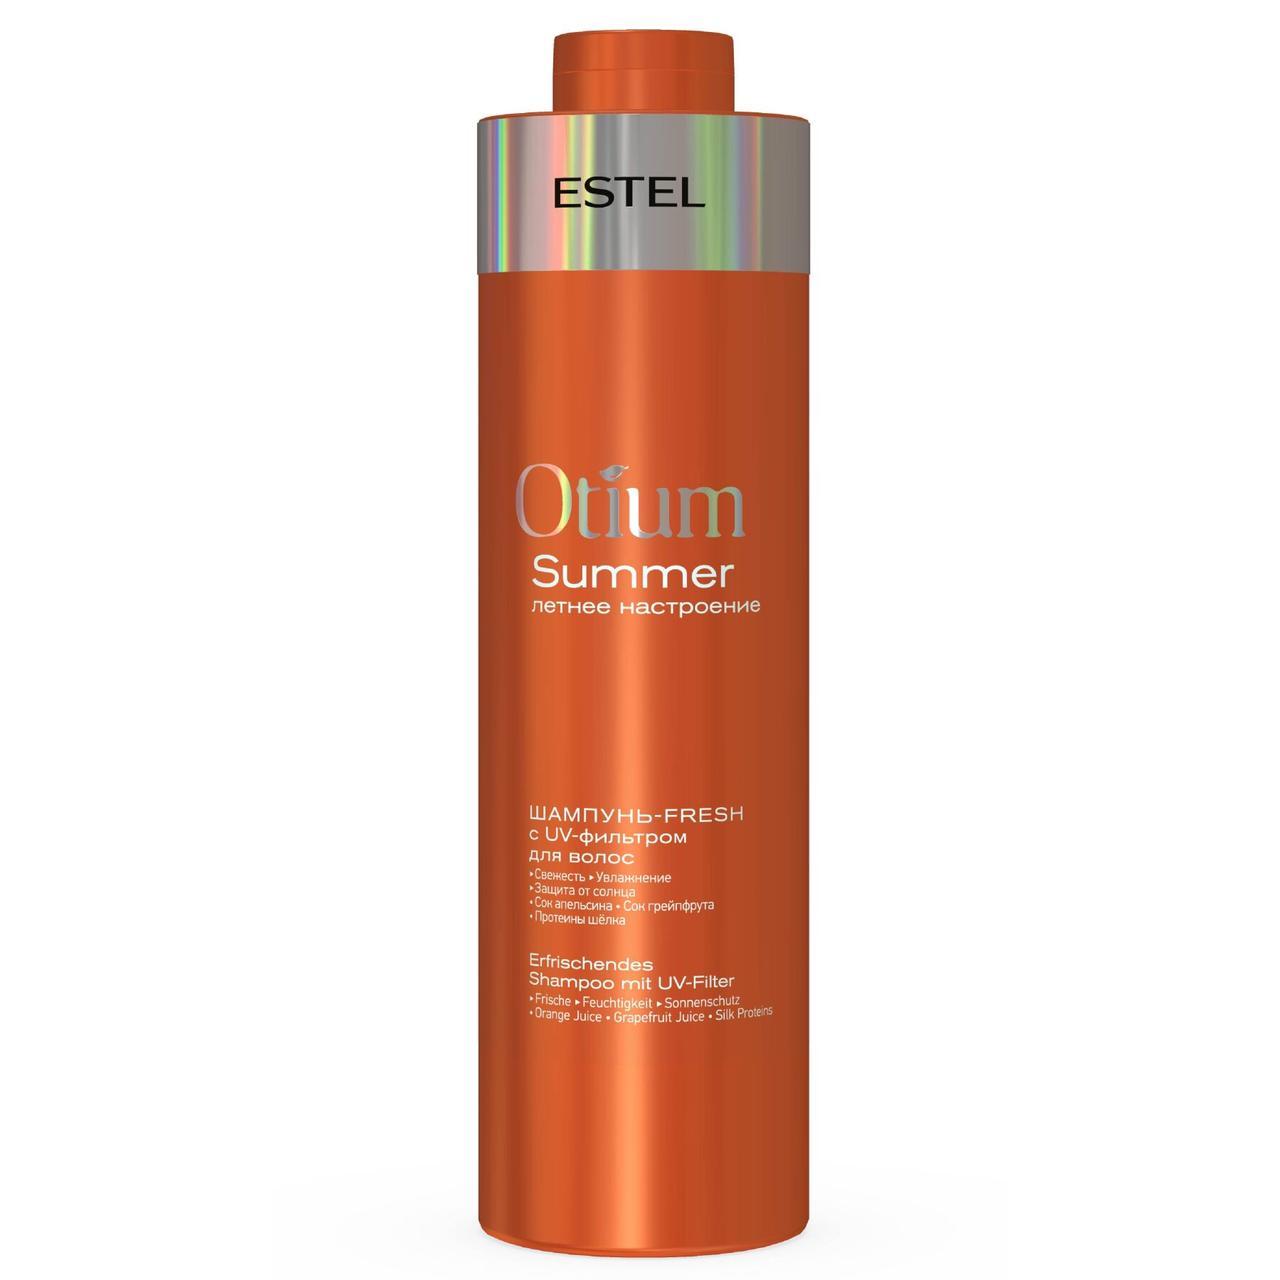 Шампунь-fresh з UV-фільтром для волосся OTIUM SUMMER, 1000 мл.